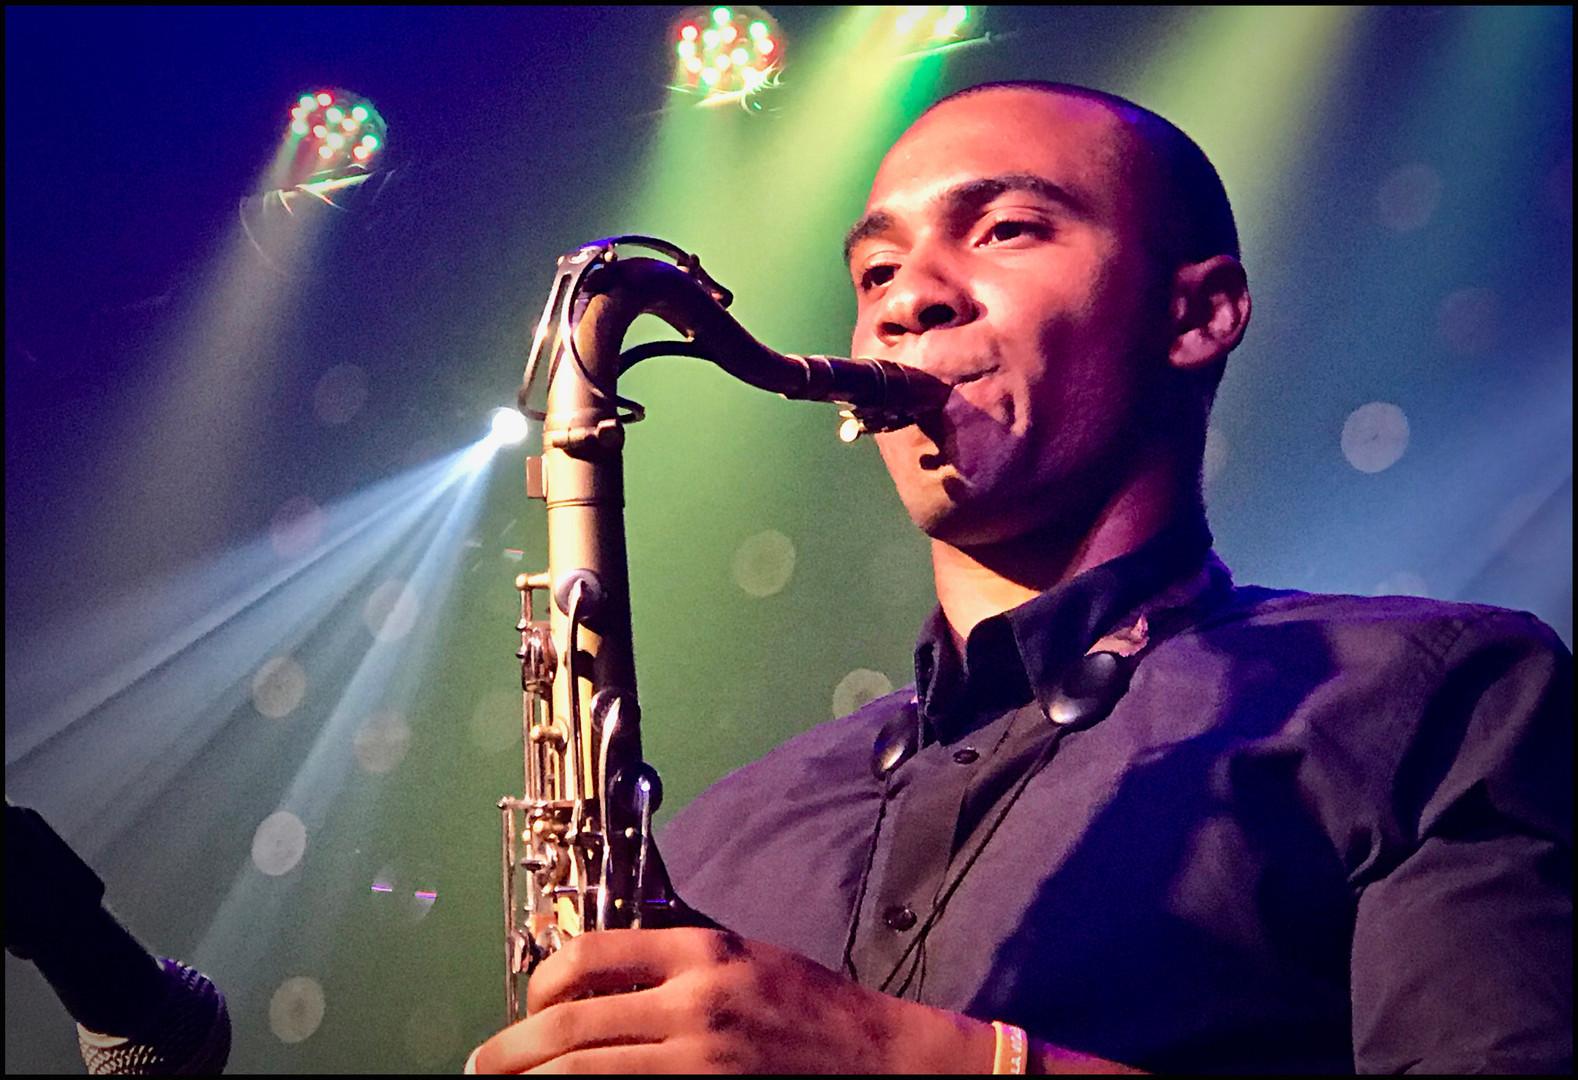 Cuban Sax Man